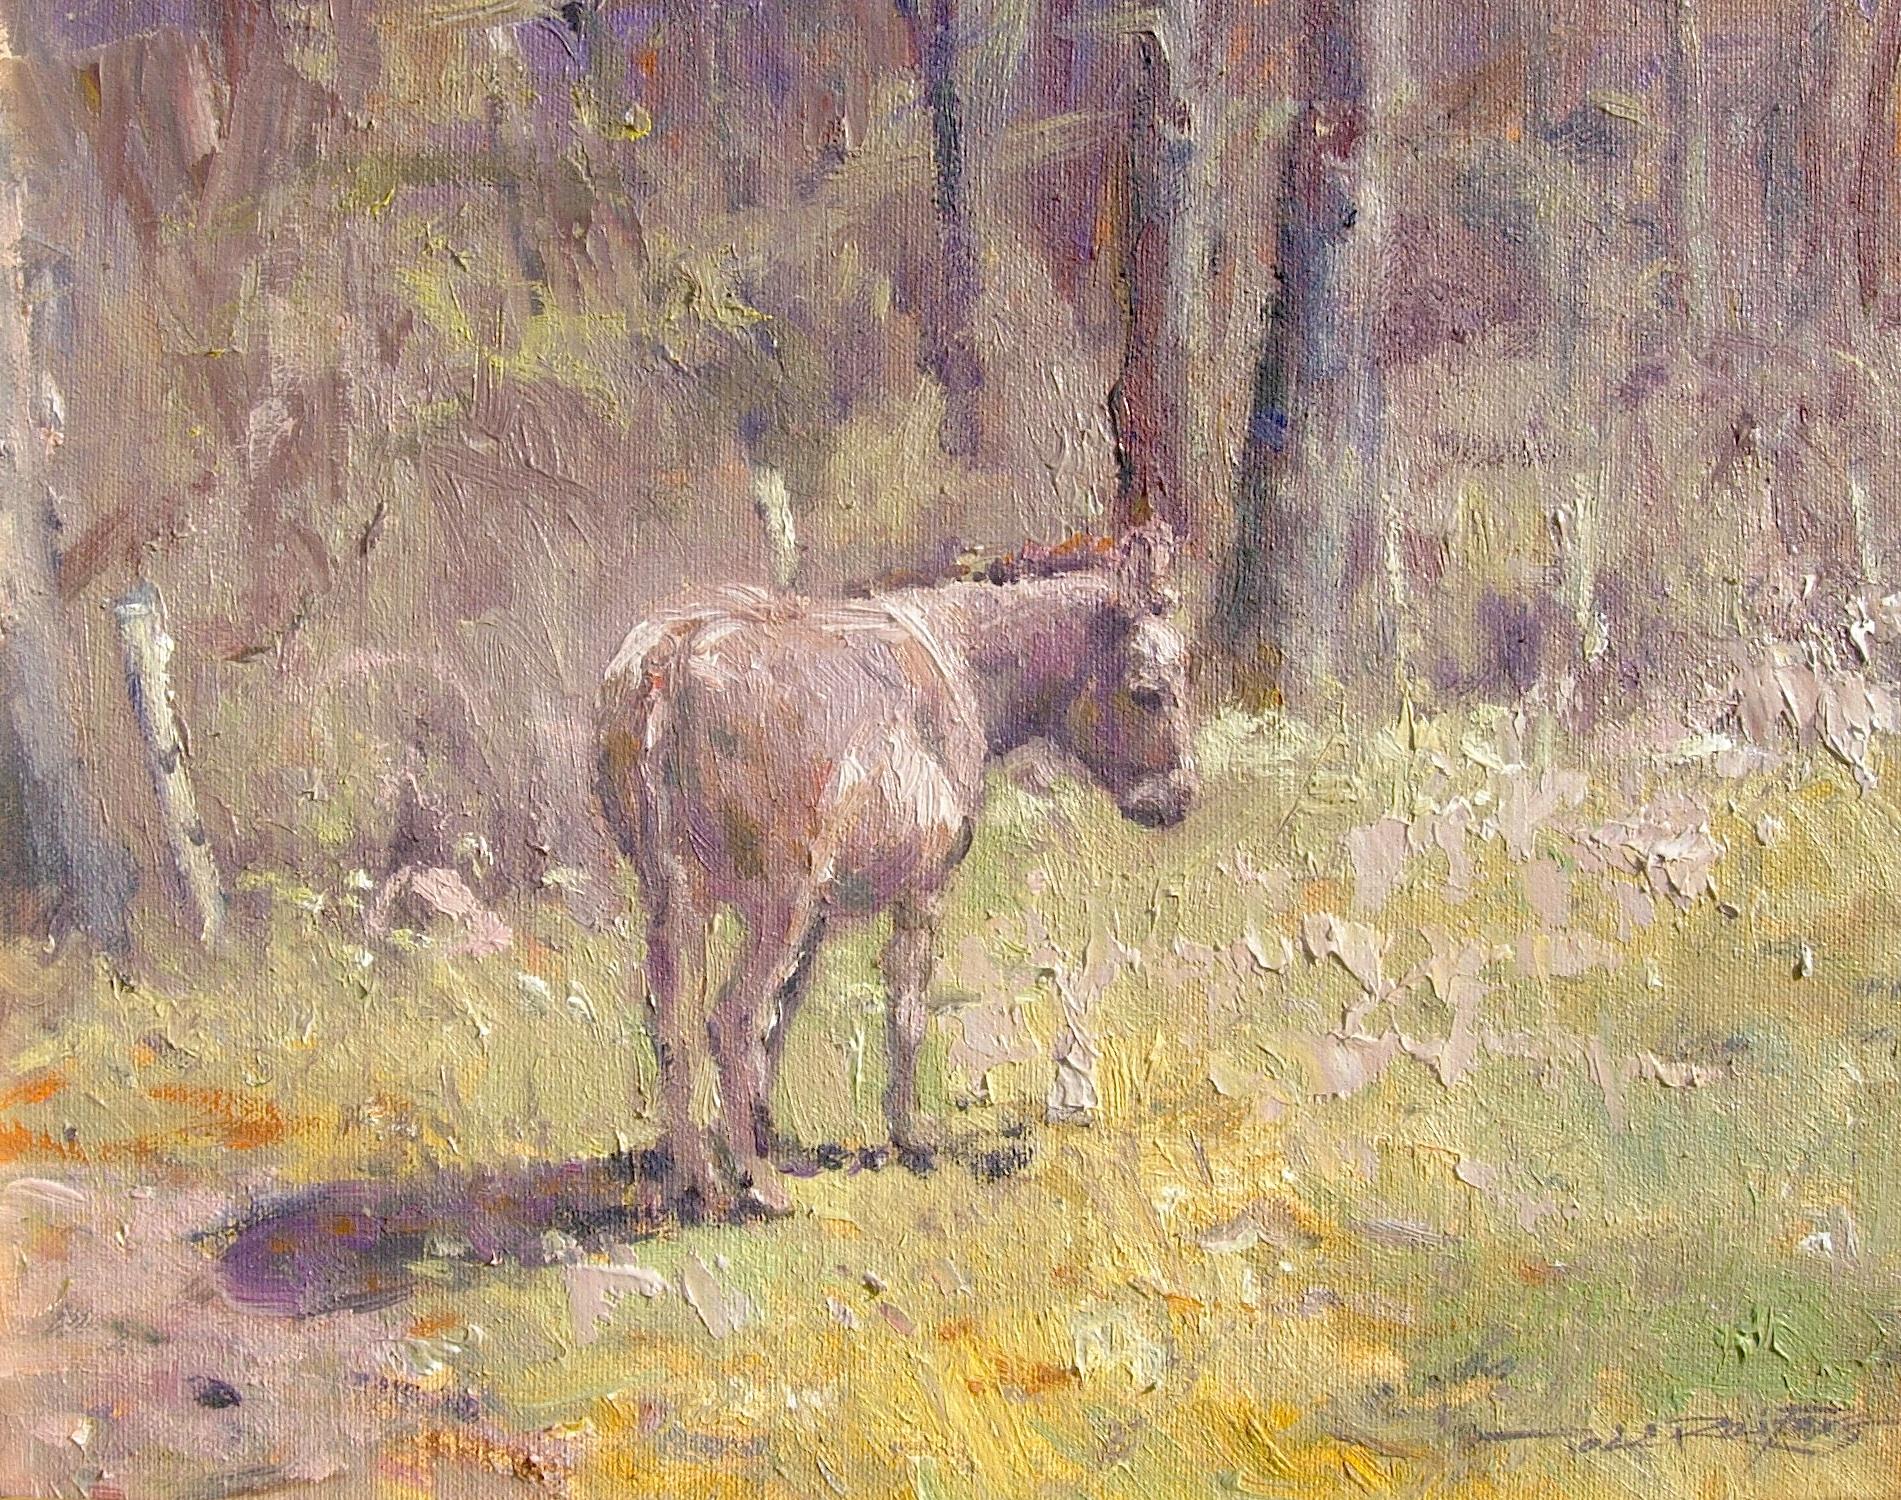 reifers-donkey-cropped